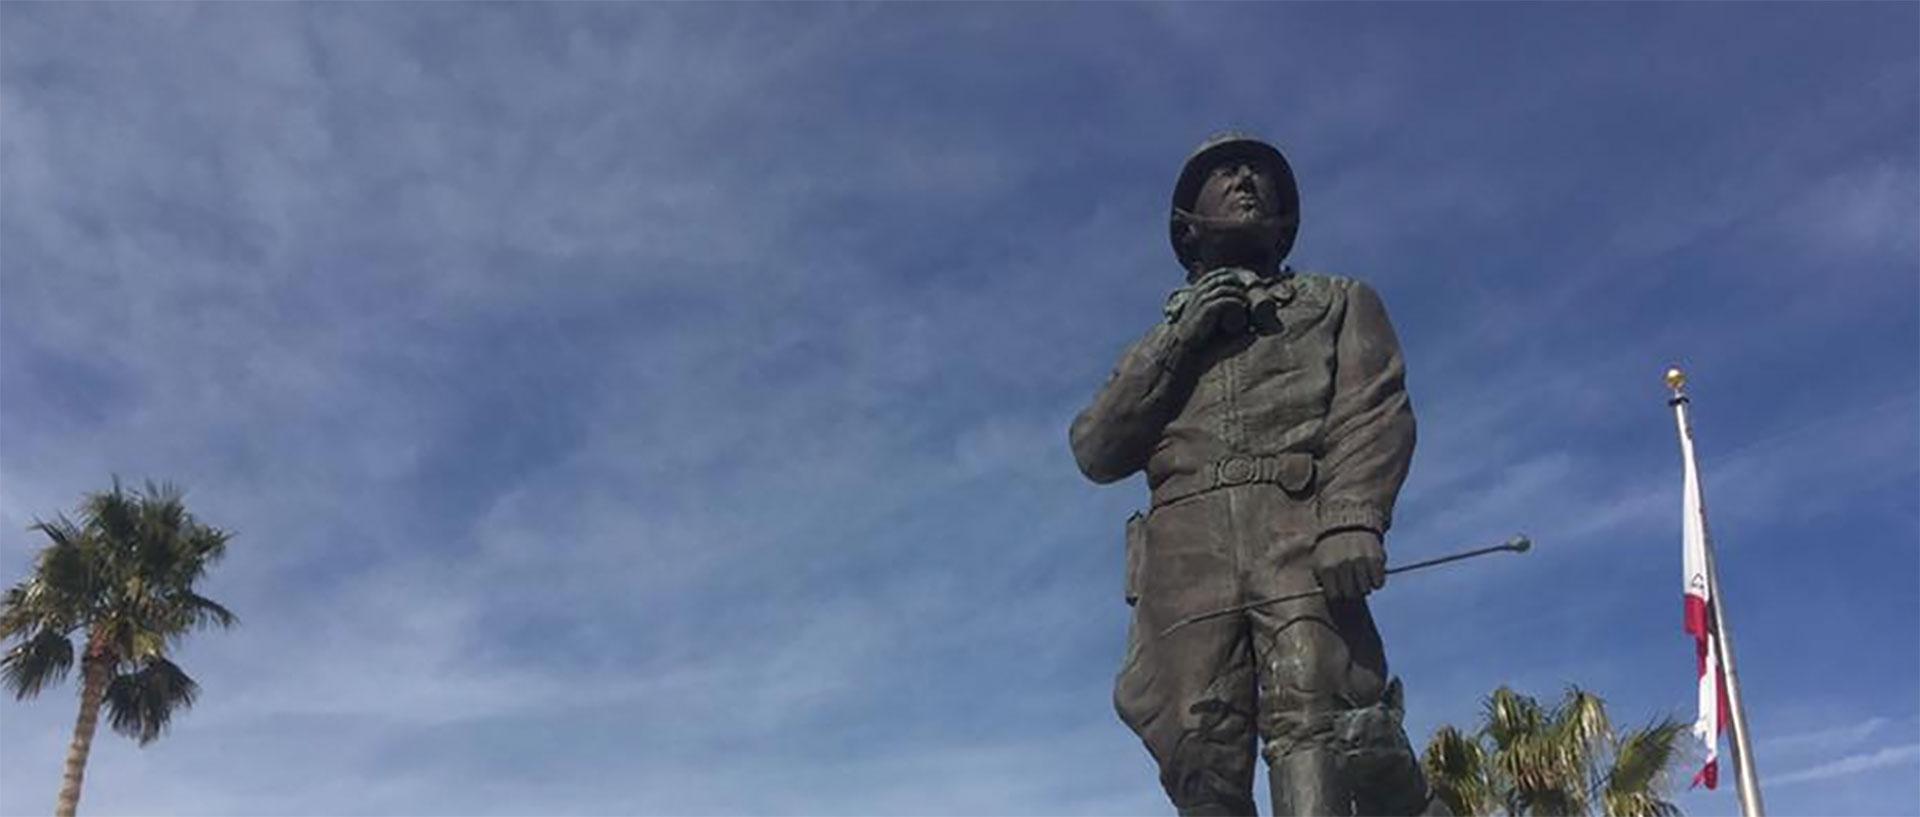 General Patton Memorial Museum slideshow image